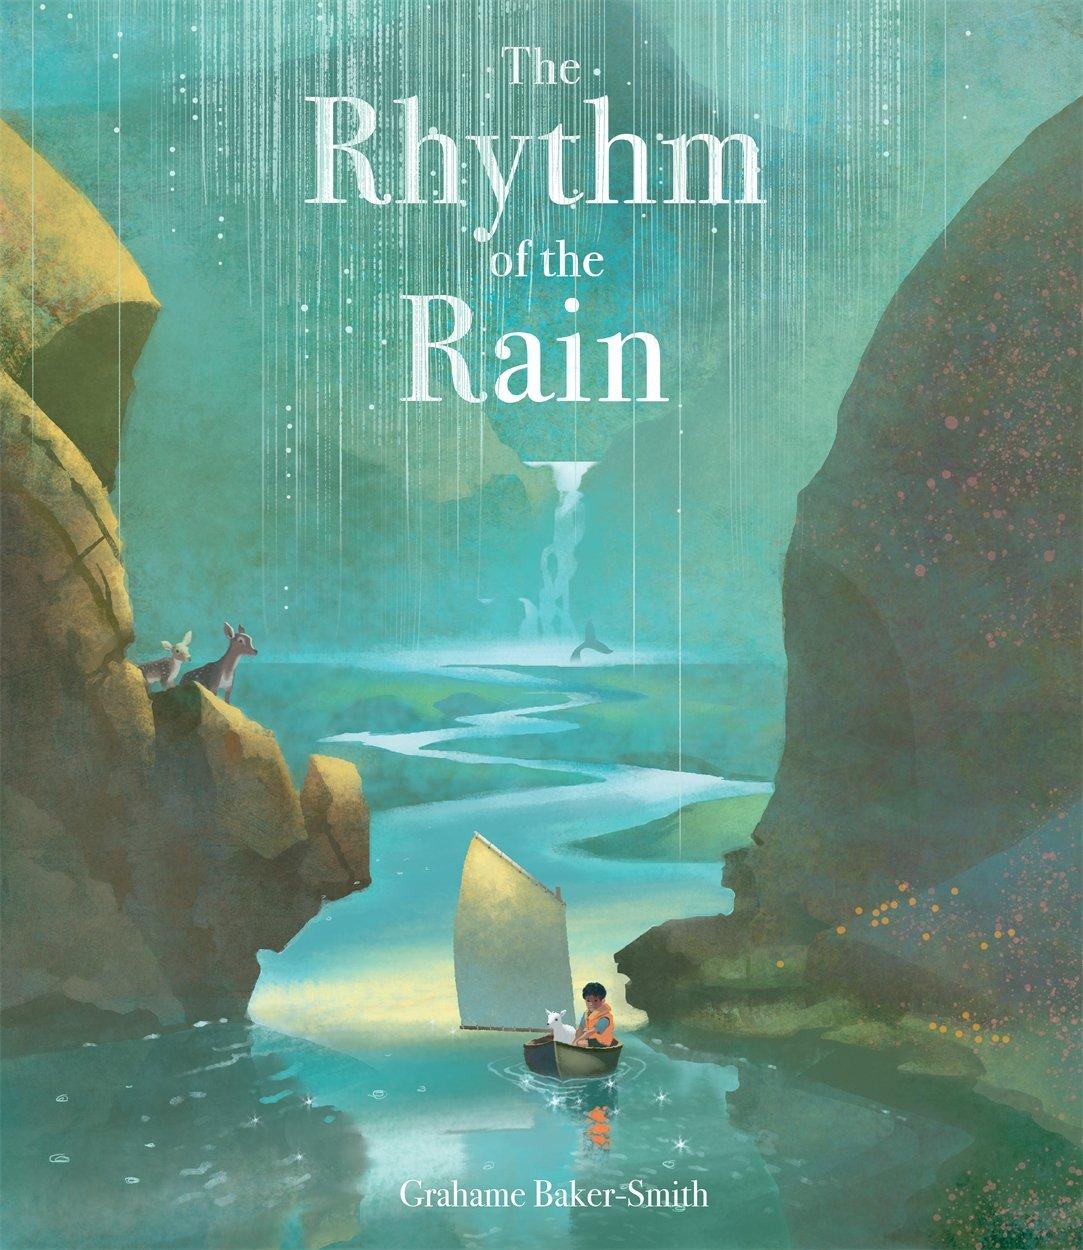 The Rhythm of the Rain: Amazon.co.uk: Baker-Smith, Grahame, Baker-Smith,  Grahame: 9781787410145: Books